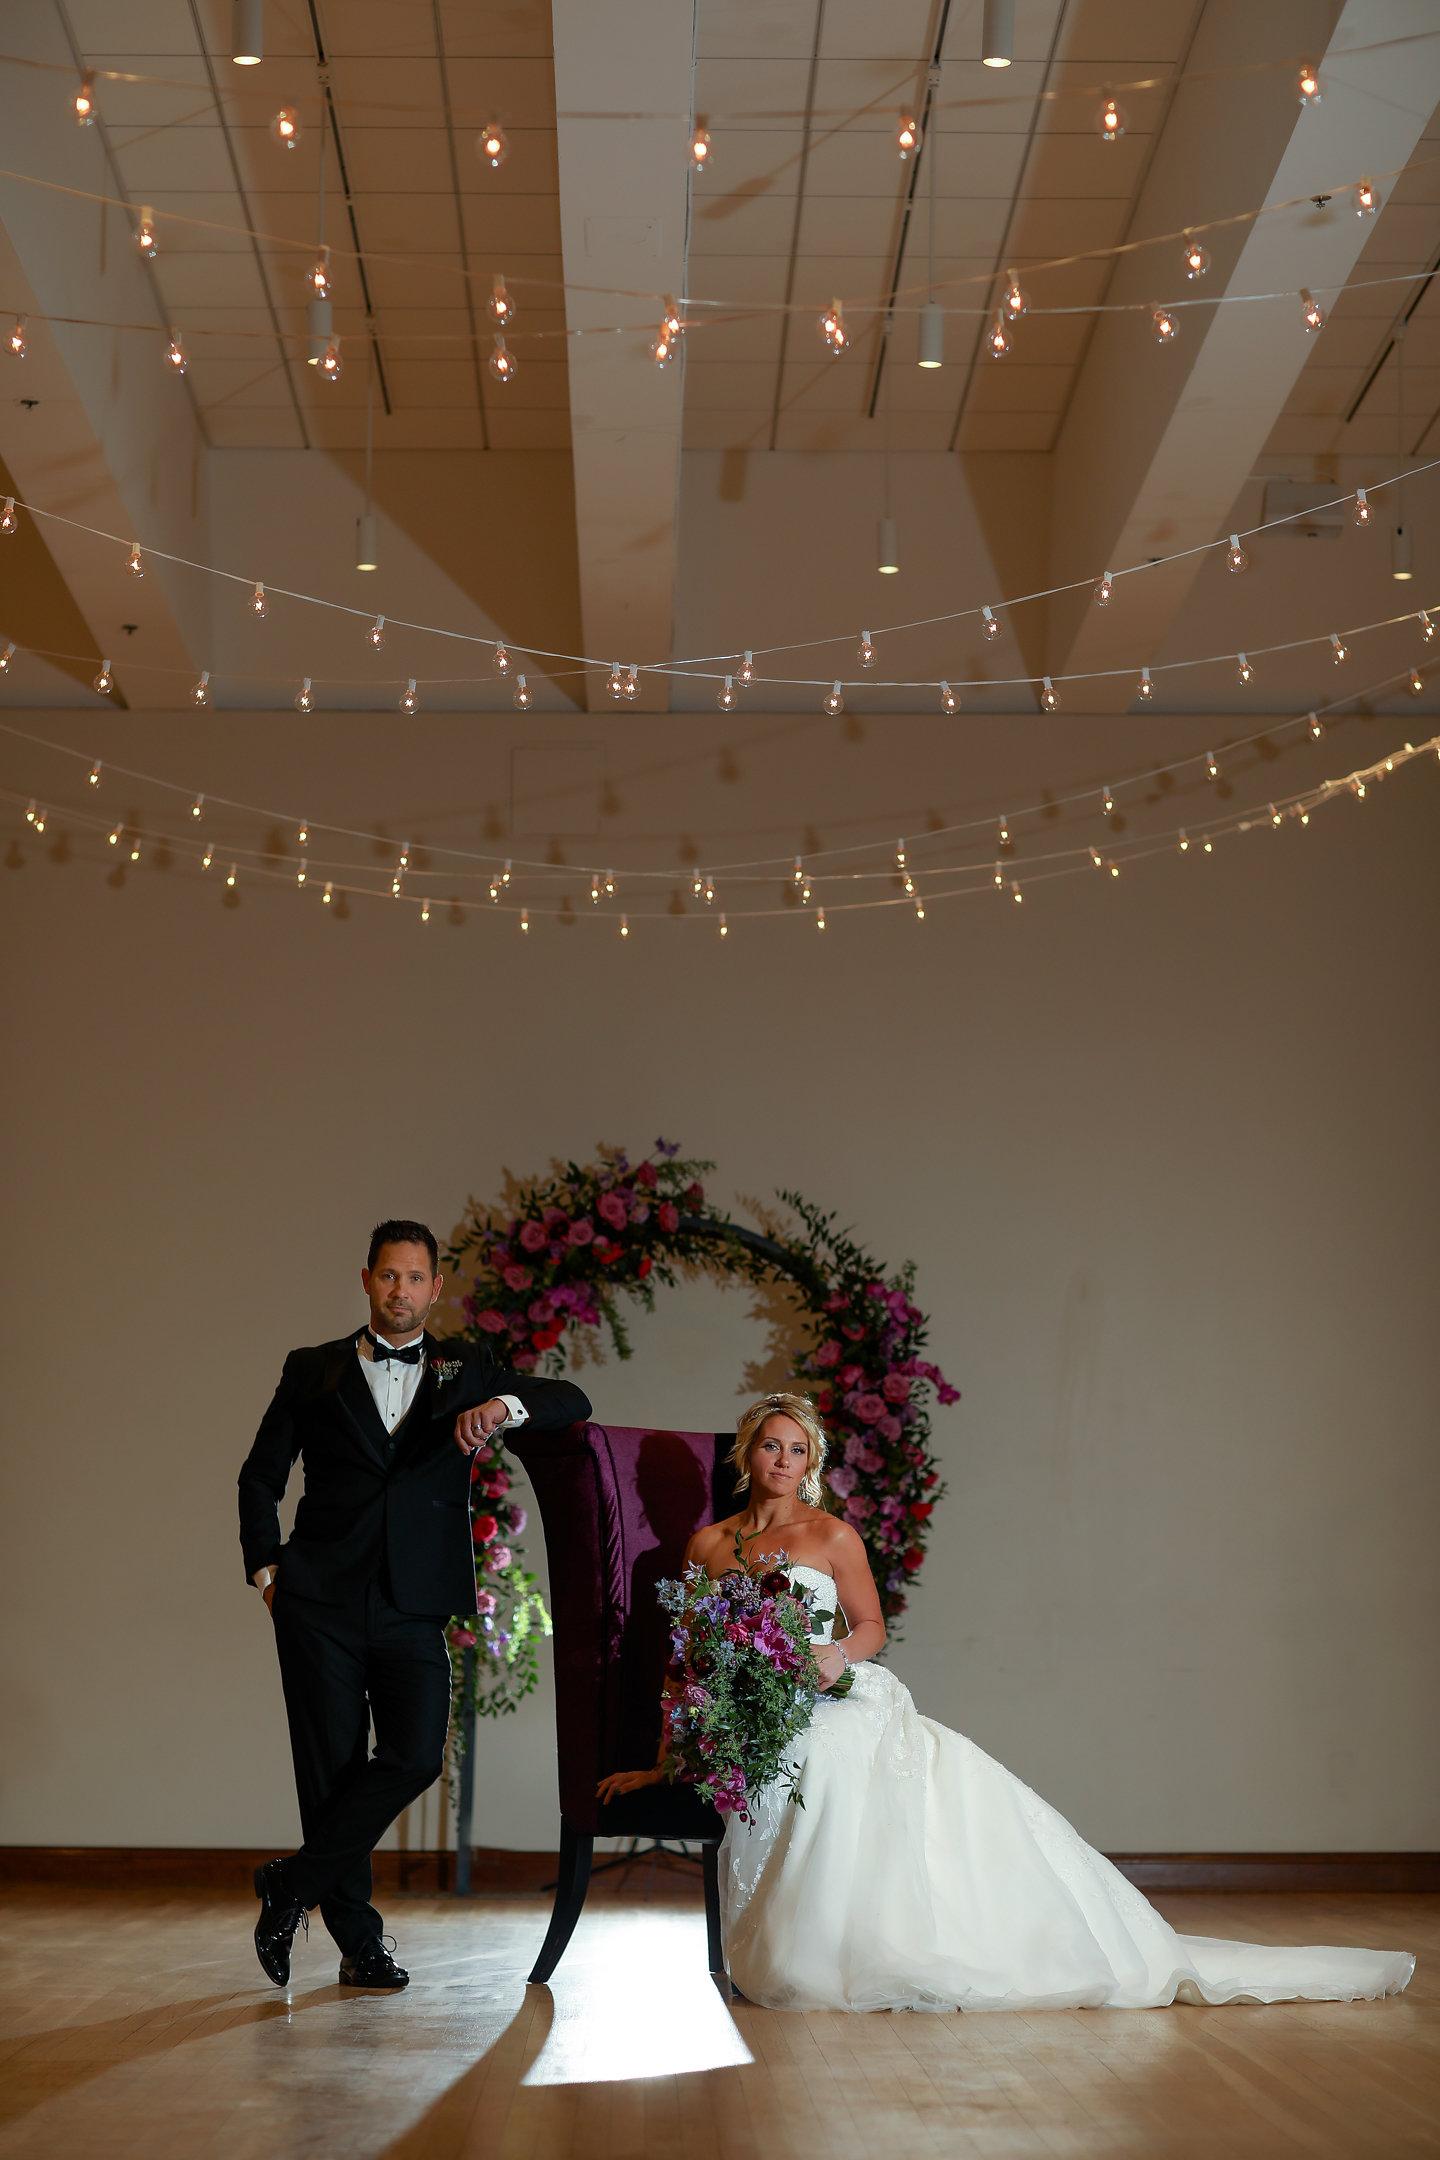 Cincinnati Wedding Planner - Cincinnati Wedding Design - Purple and Gold Wedding - Sherri Barber Photography